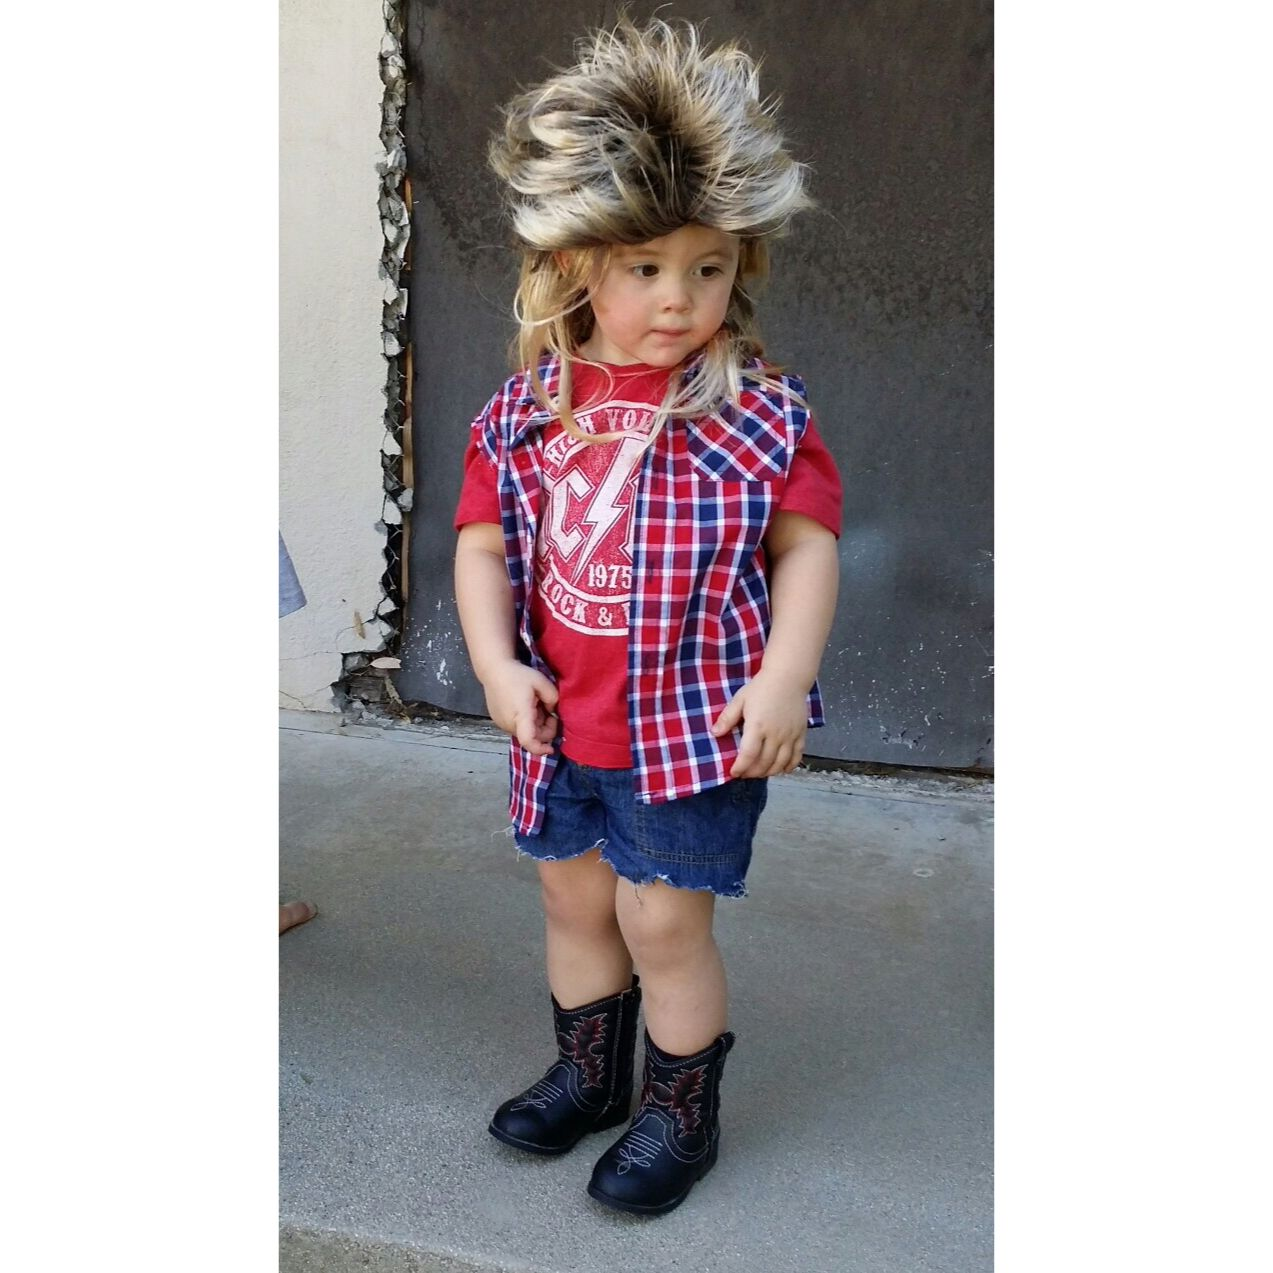 Joe Dirt Halloween Costume for toddlers   Carson   Pinterest   Joe ...